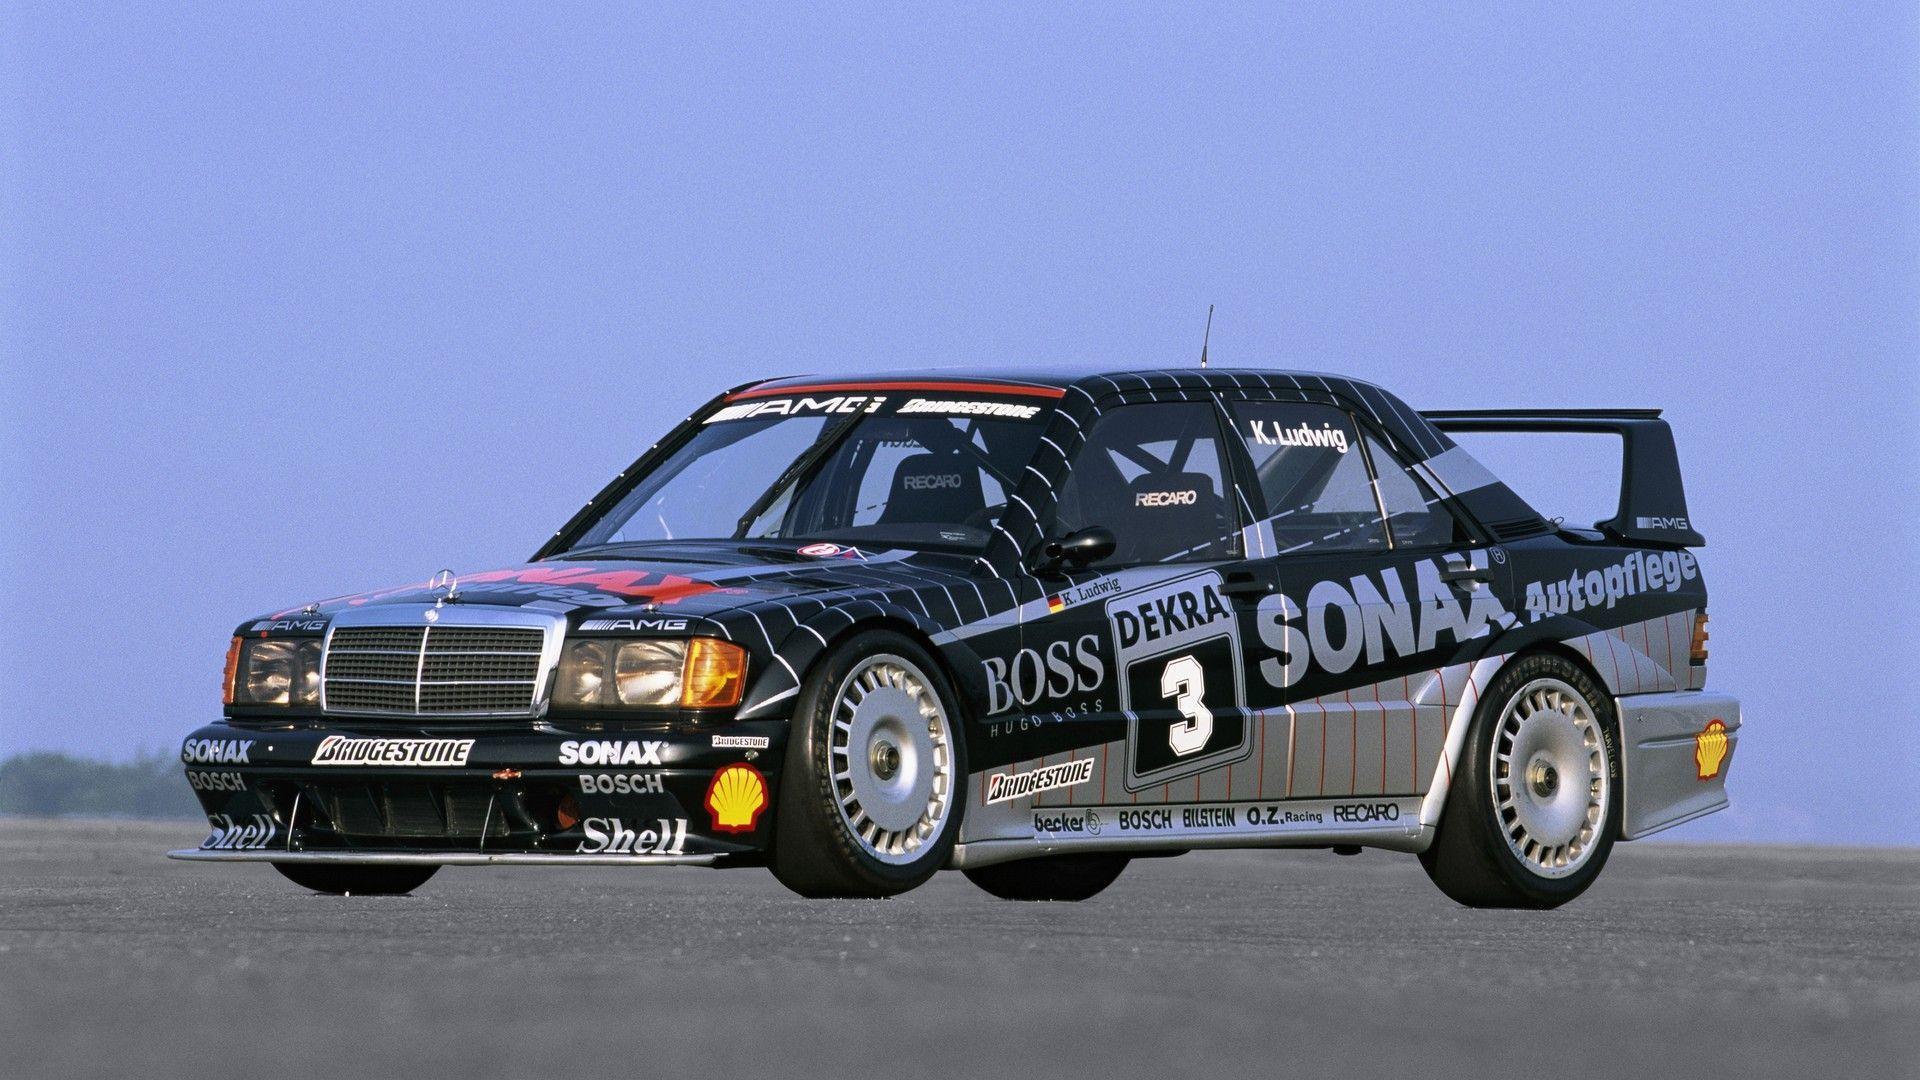 mercedes-benz-190e-evo-ii-racer